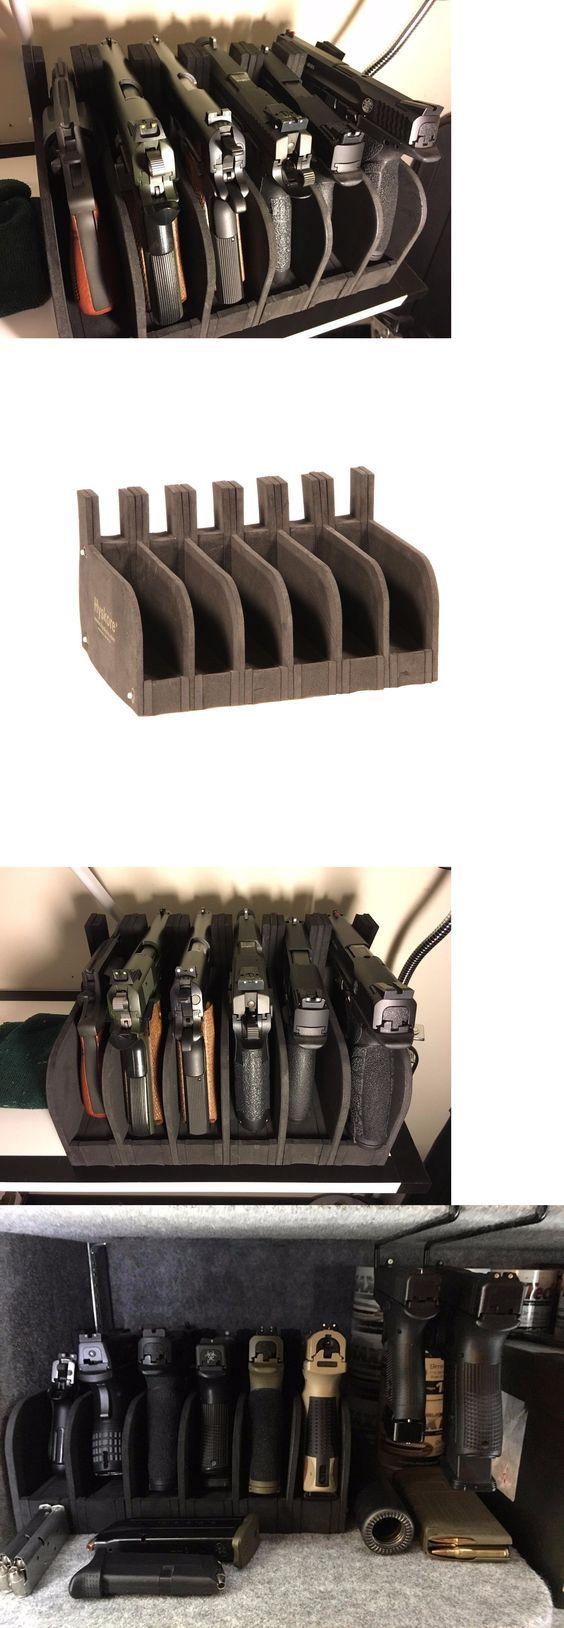 Double pistol handgun revolver gun display case cabinet rack shadowbox - Double Pistol Handgun Revolver Gun Display Case Cabinet Rack Shadowbox 64